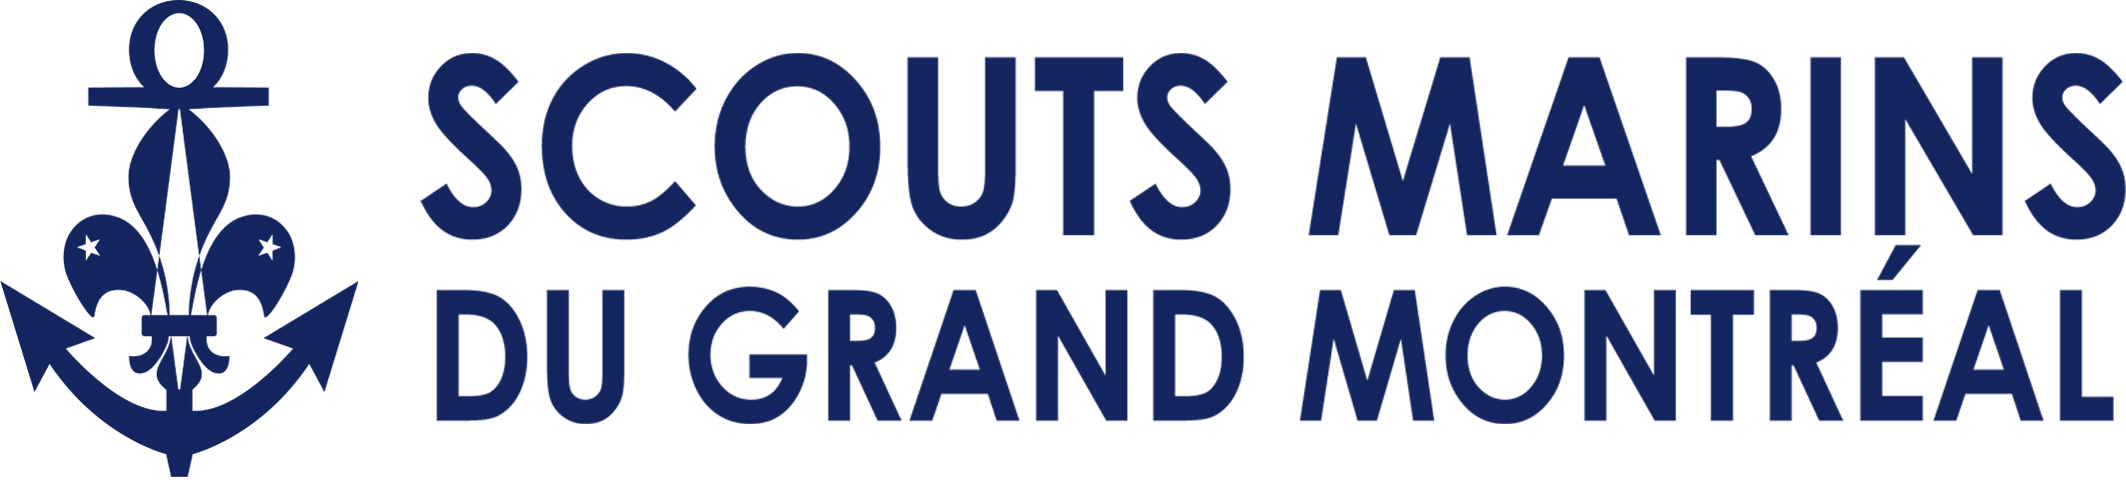 ScoutsMarinsduGrand Montréal Logo